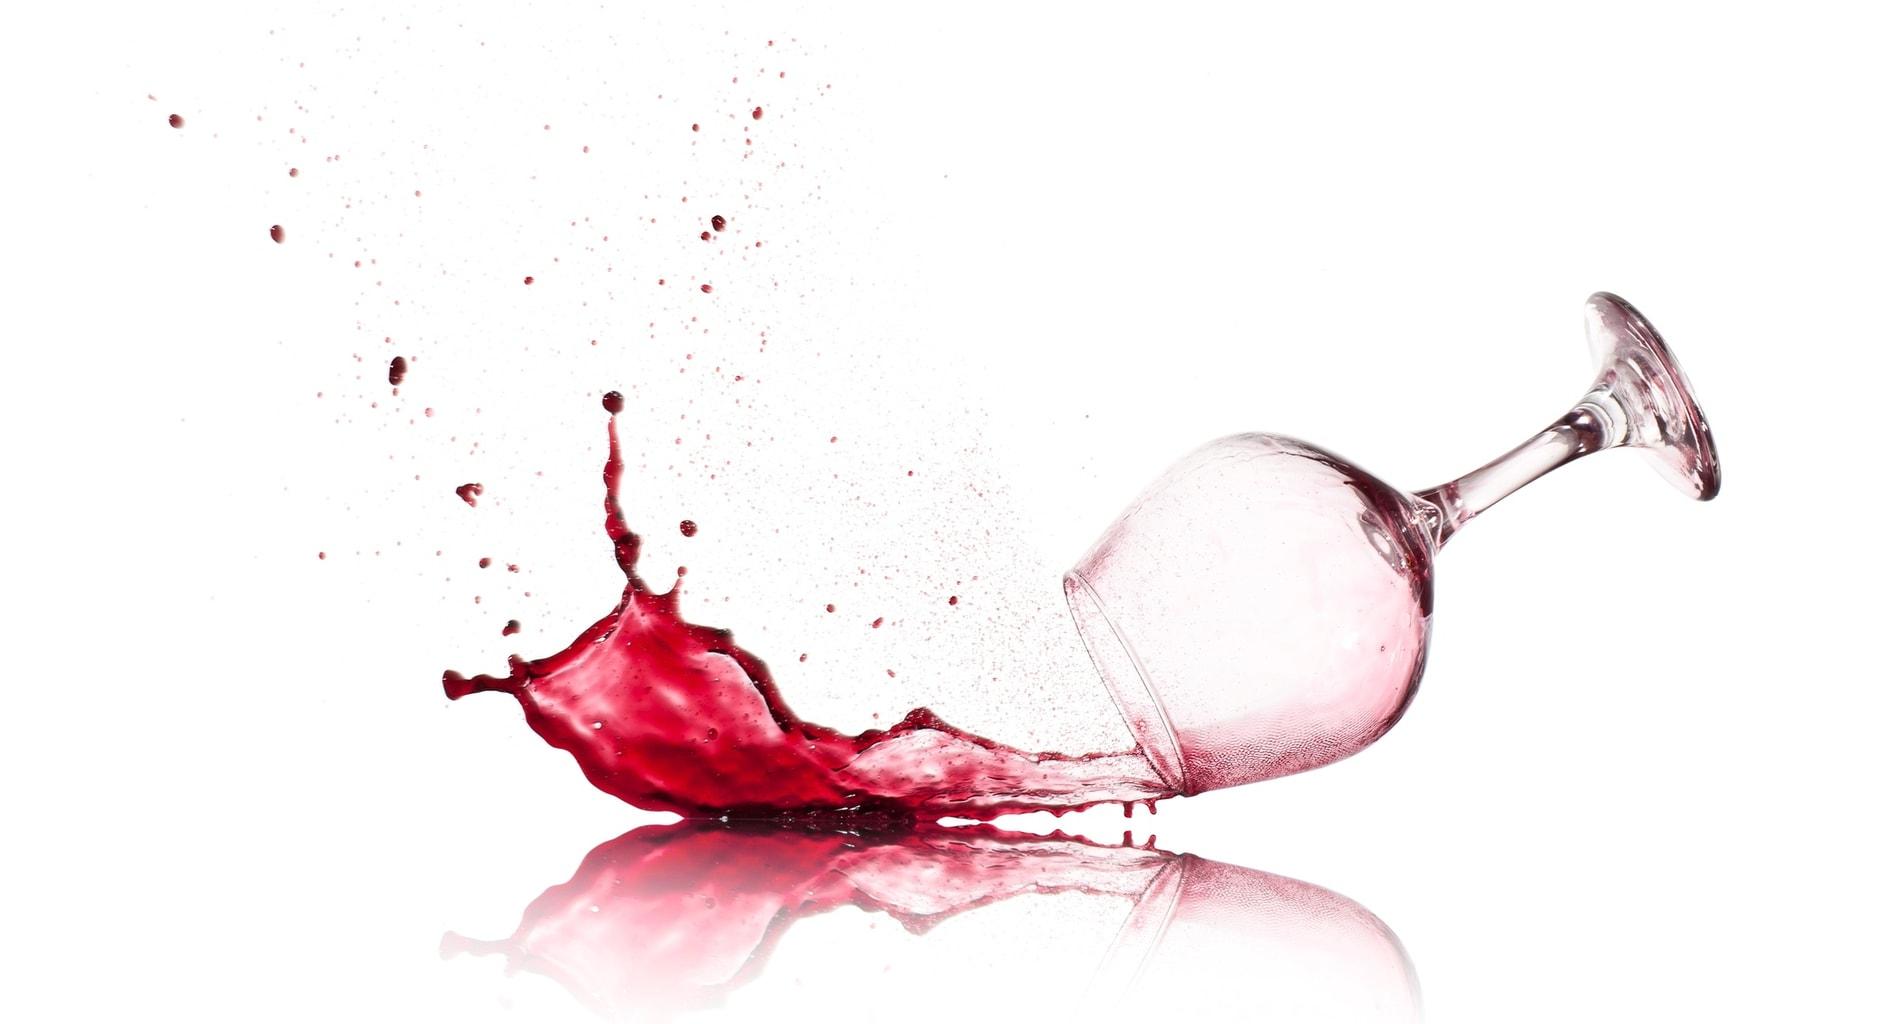 Wine Sitter - The Elegant Wine Accessory to Secure Stemware